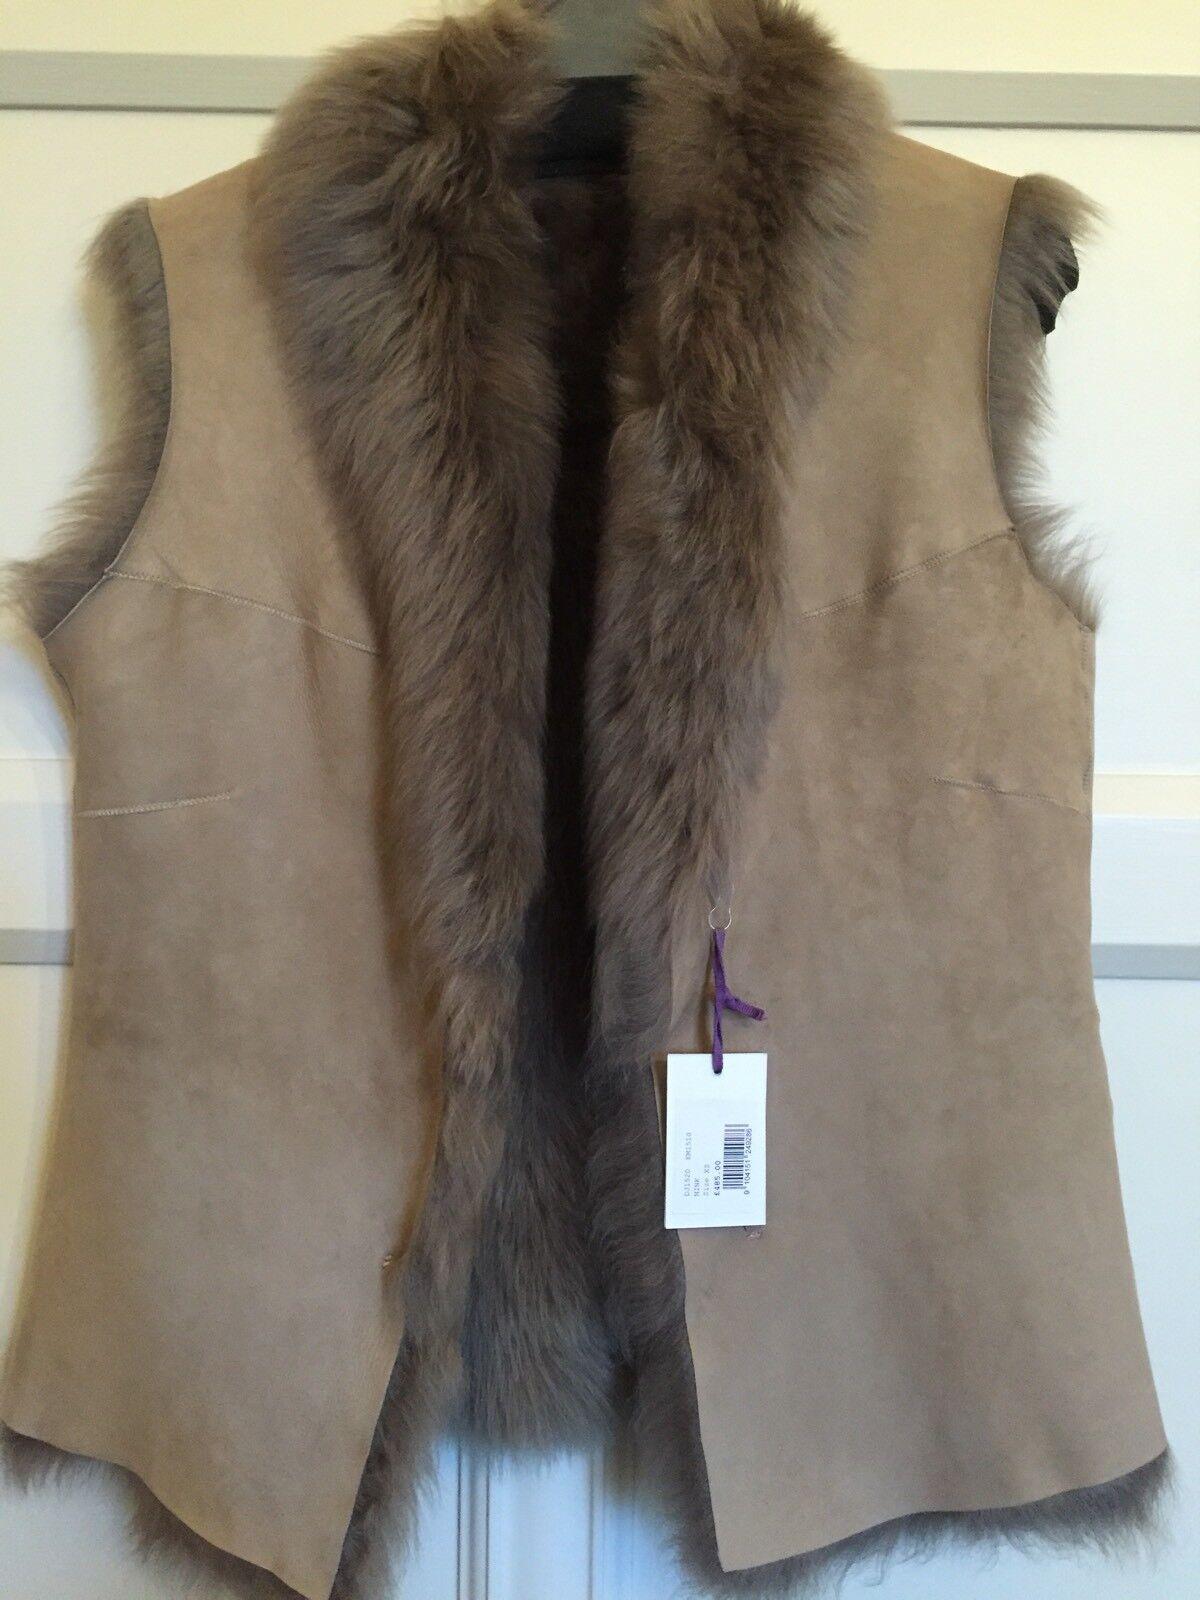 BRORA BRORA BRORA LONG HAIRED SHEEPSKIN GILET (MINK) UK XS. BRAND NEW - PRISTINE RRP 1e135c